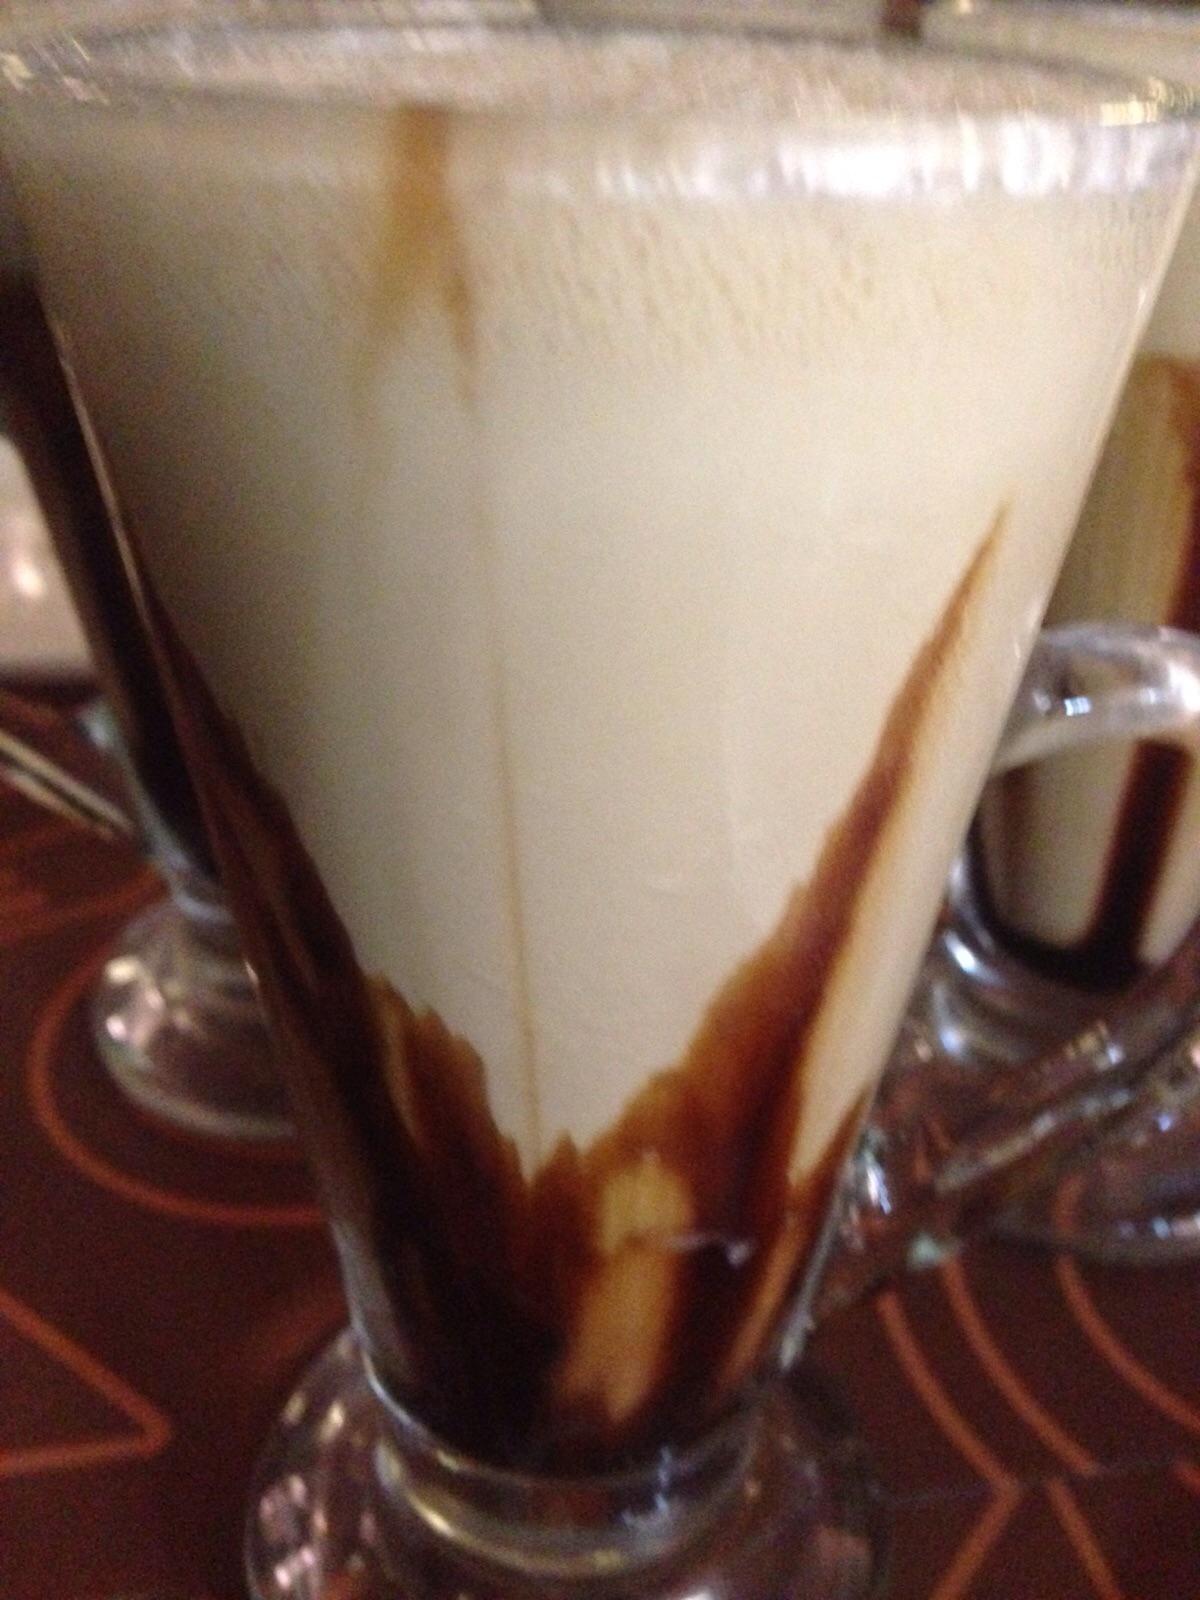 Choco-Cream Frappe